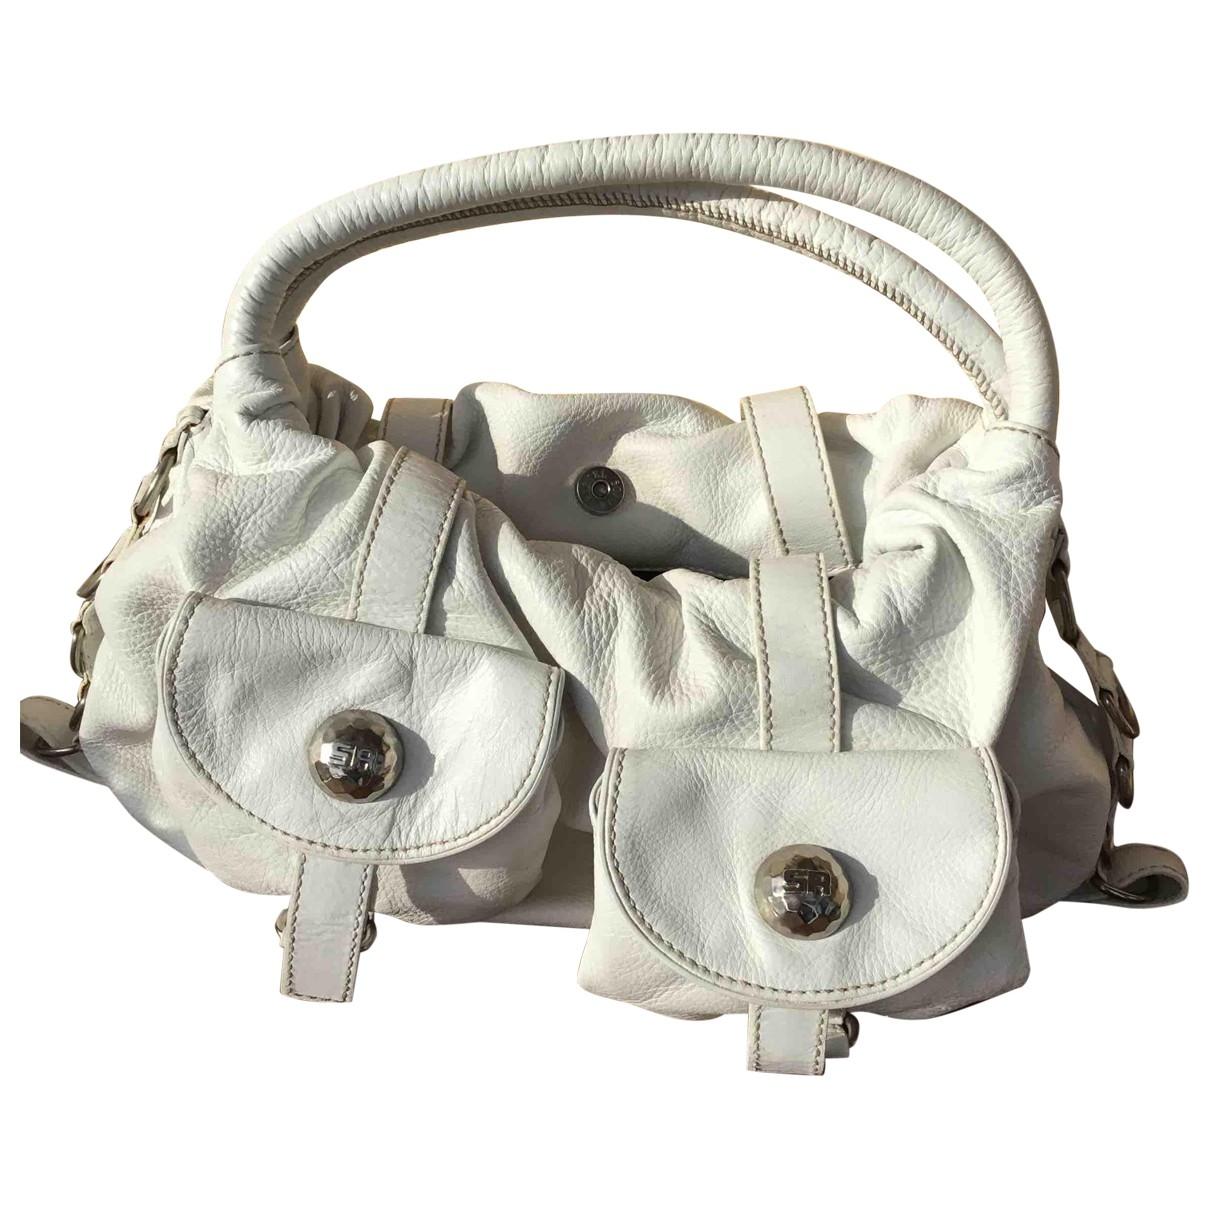 Sonia Rykiel \N White Leather handbag for Women \N